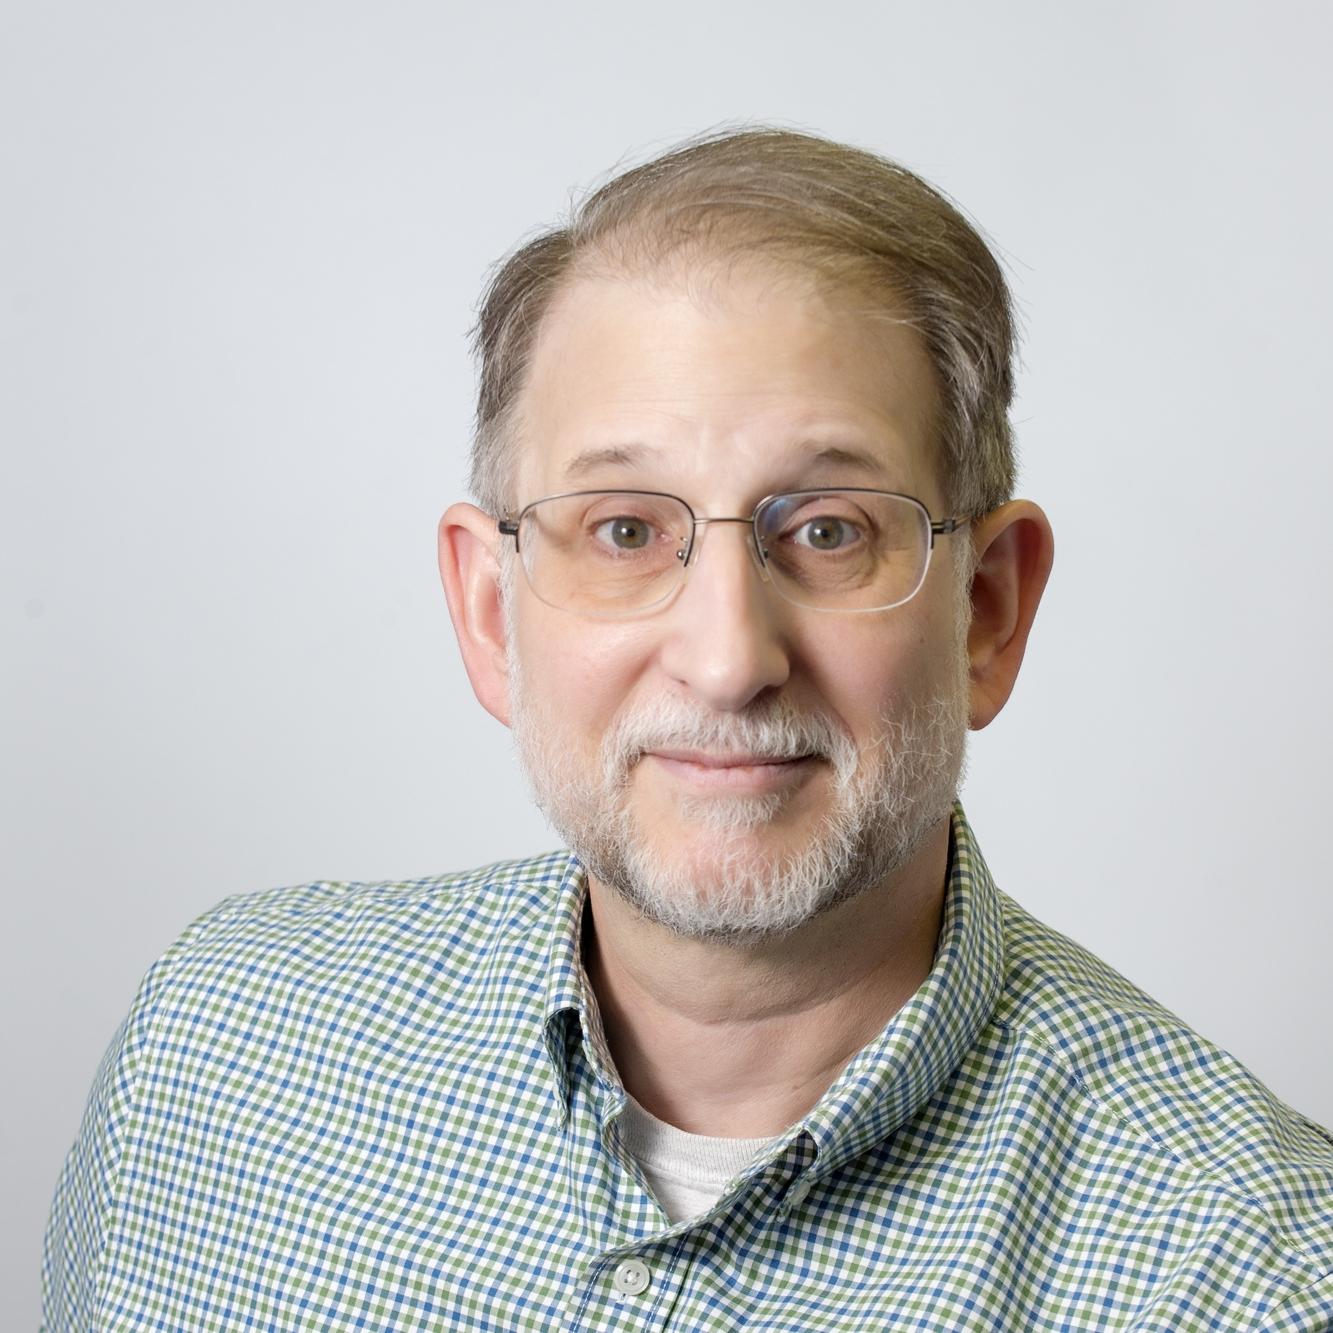 David H. Spivak, MS, CCC-SLP Speech Pathologist